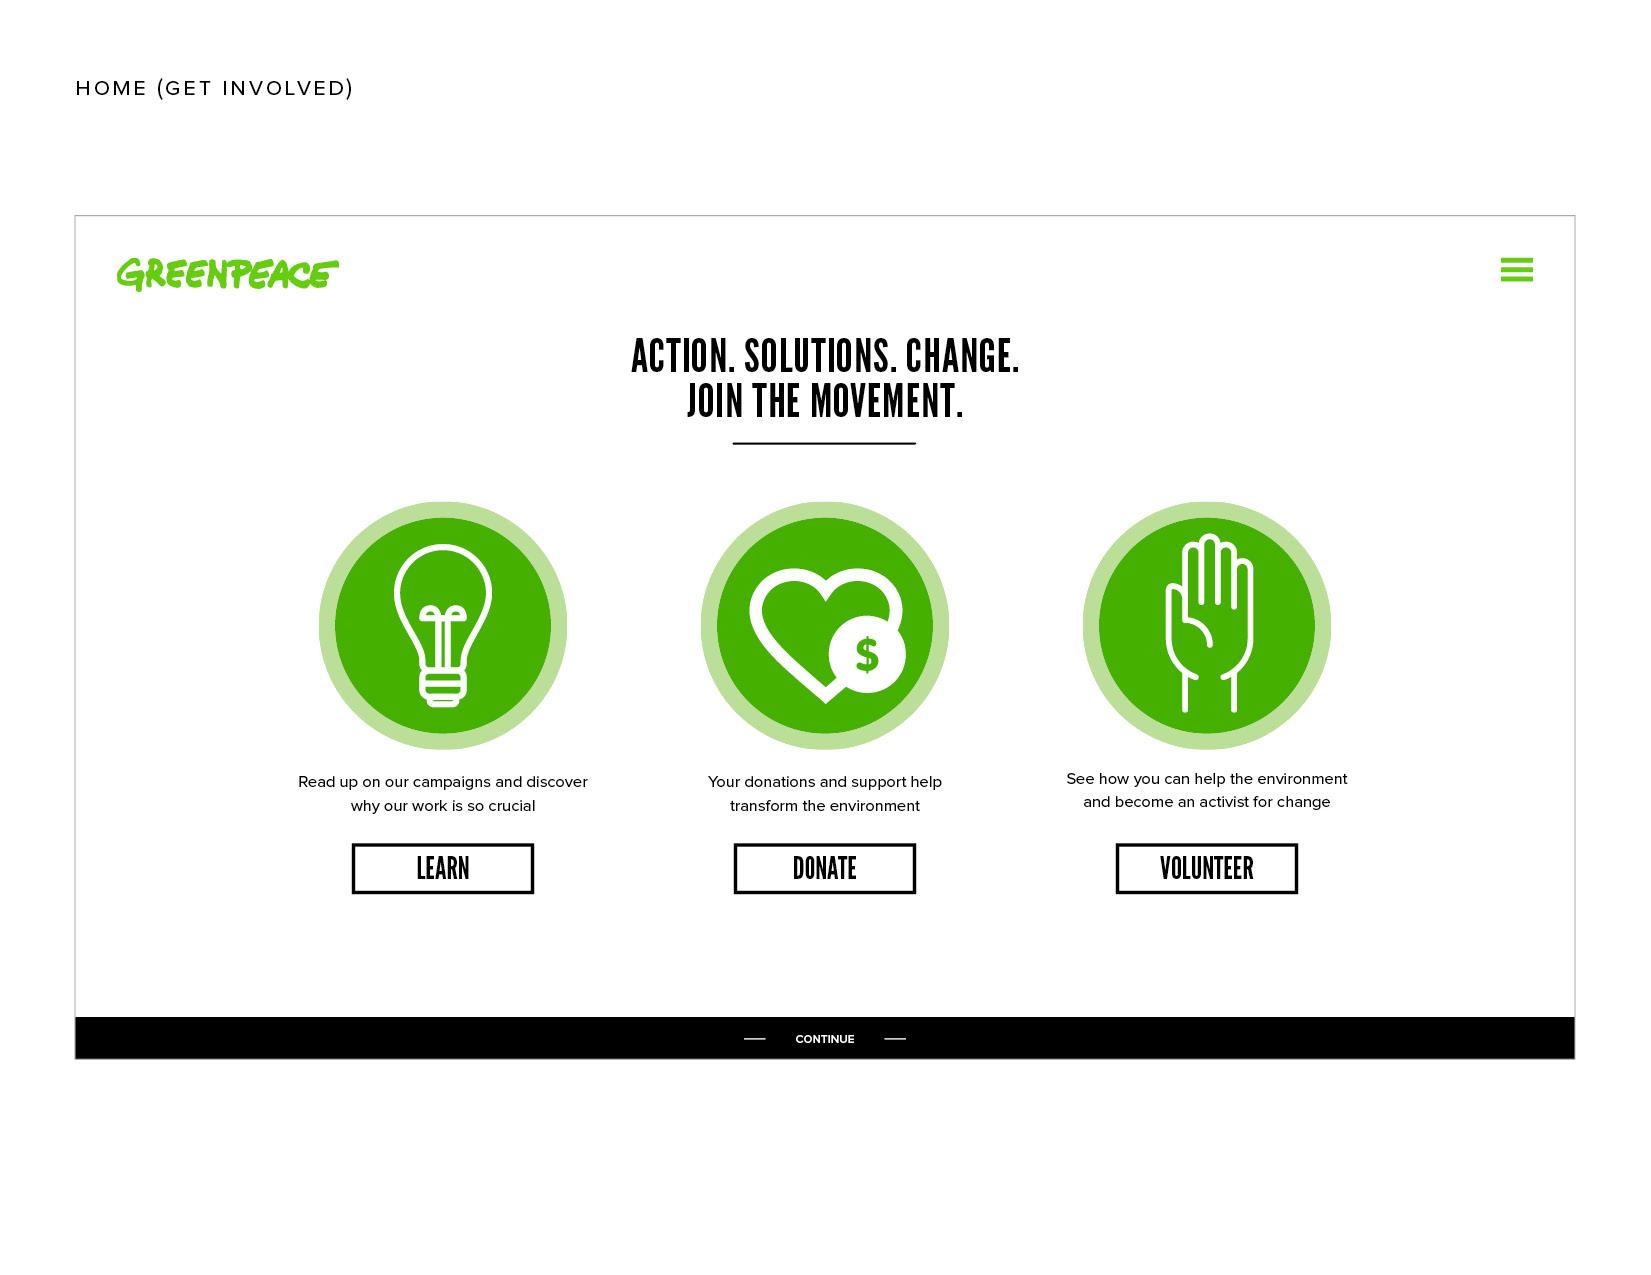 greenpeace11.jpg